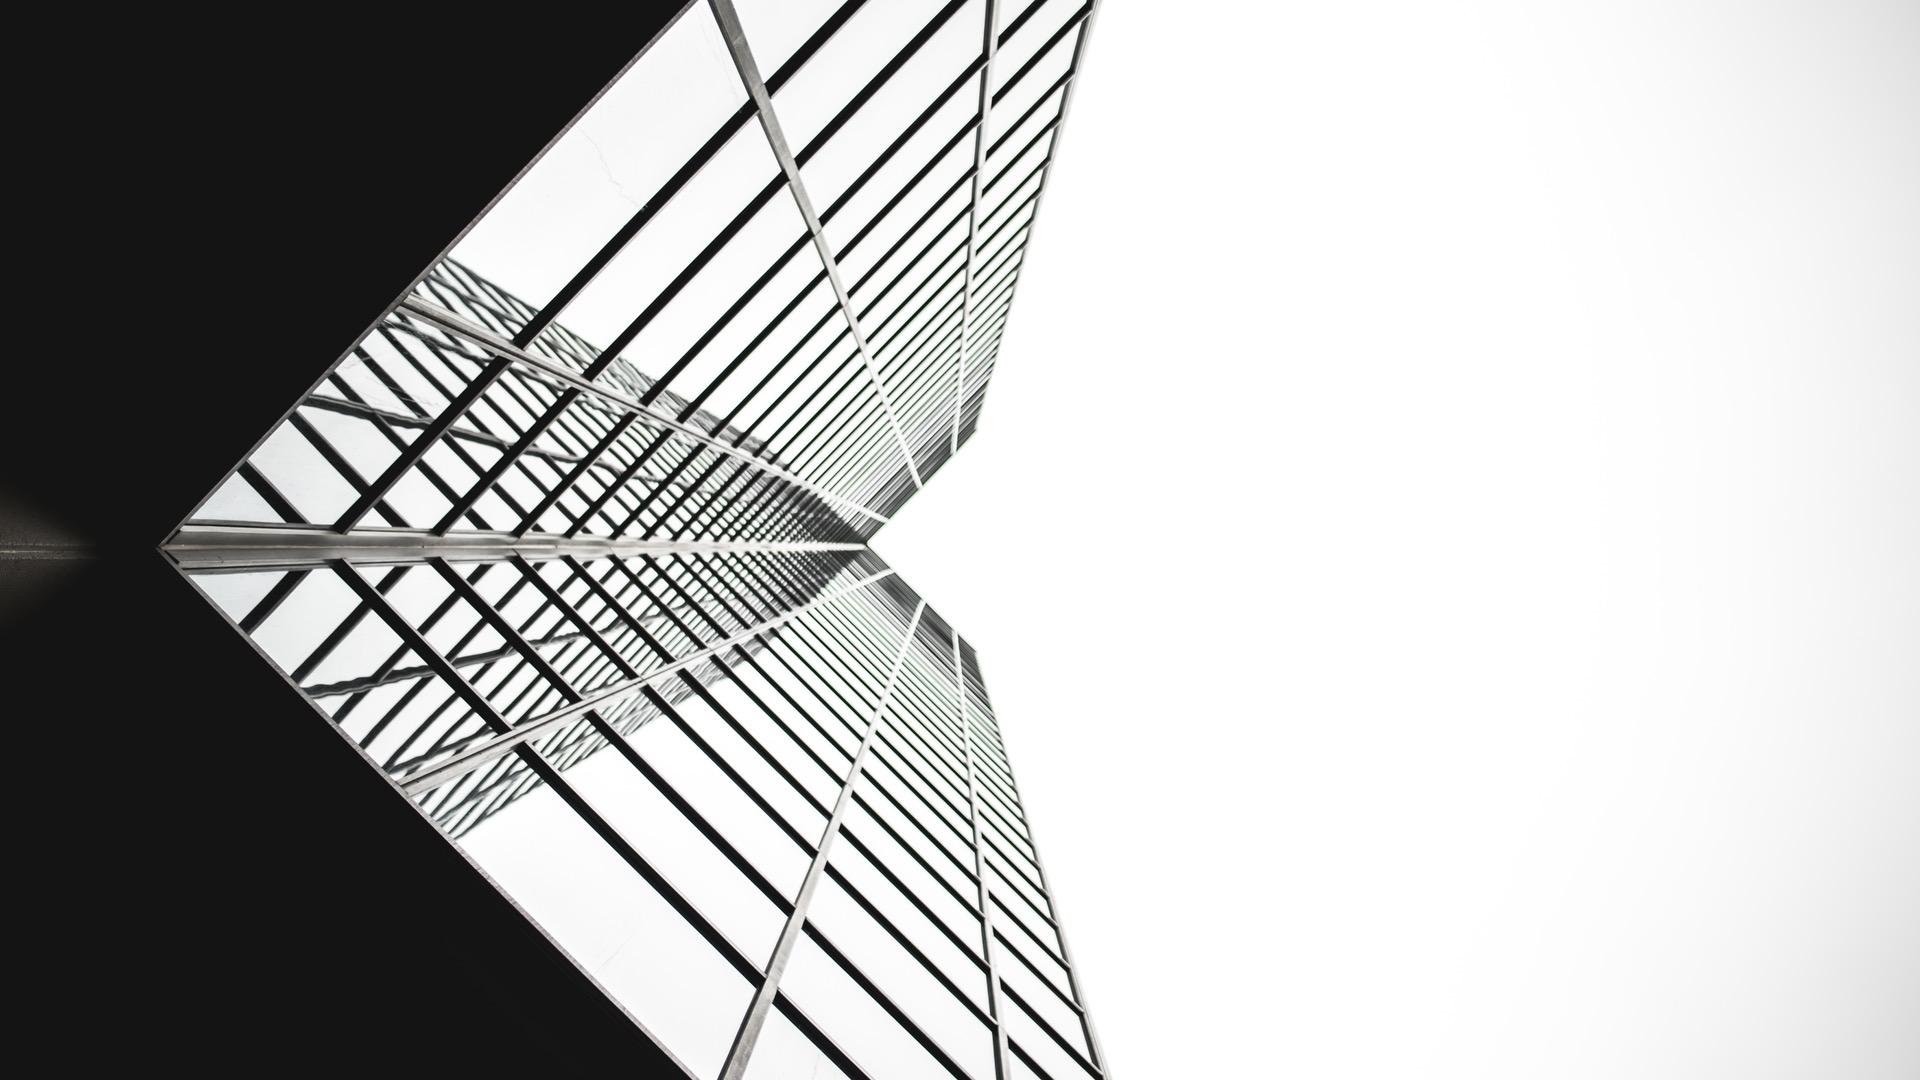 pexels-photo-90830.jpeg